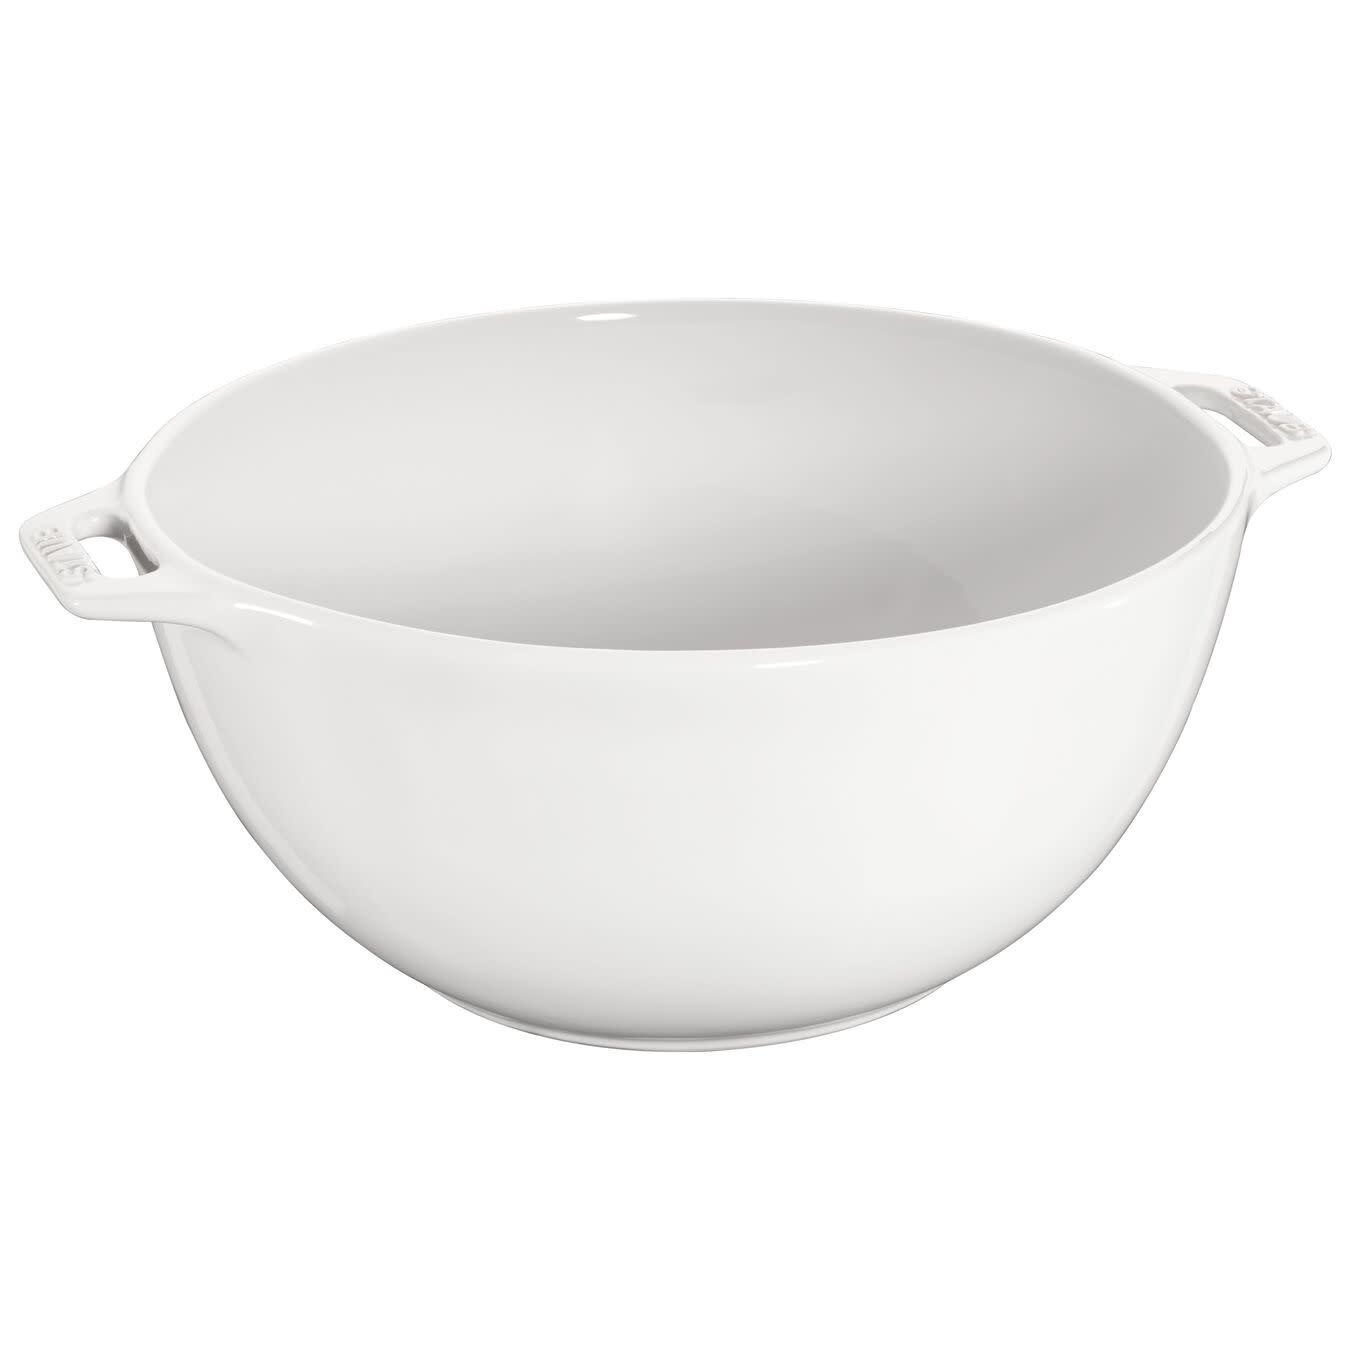 "Staub Serving Bowl Large White 25cm/9.8"""